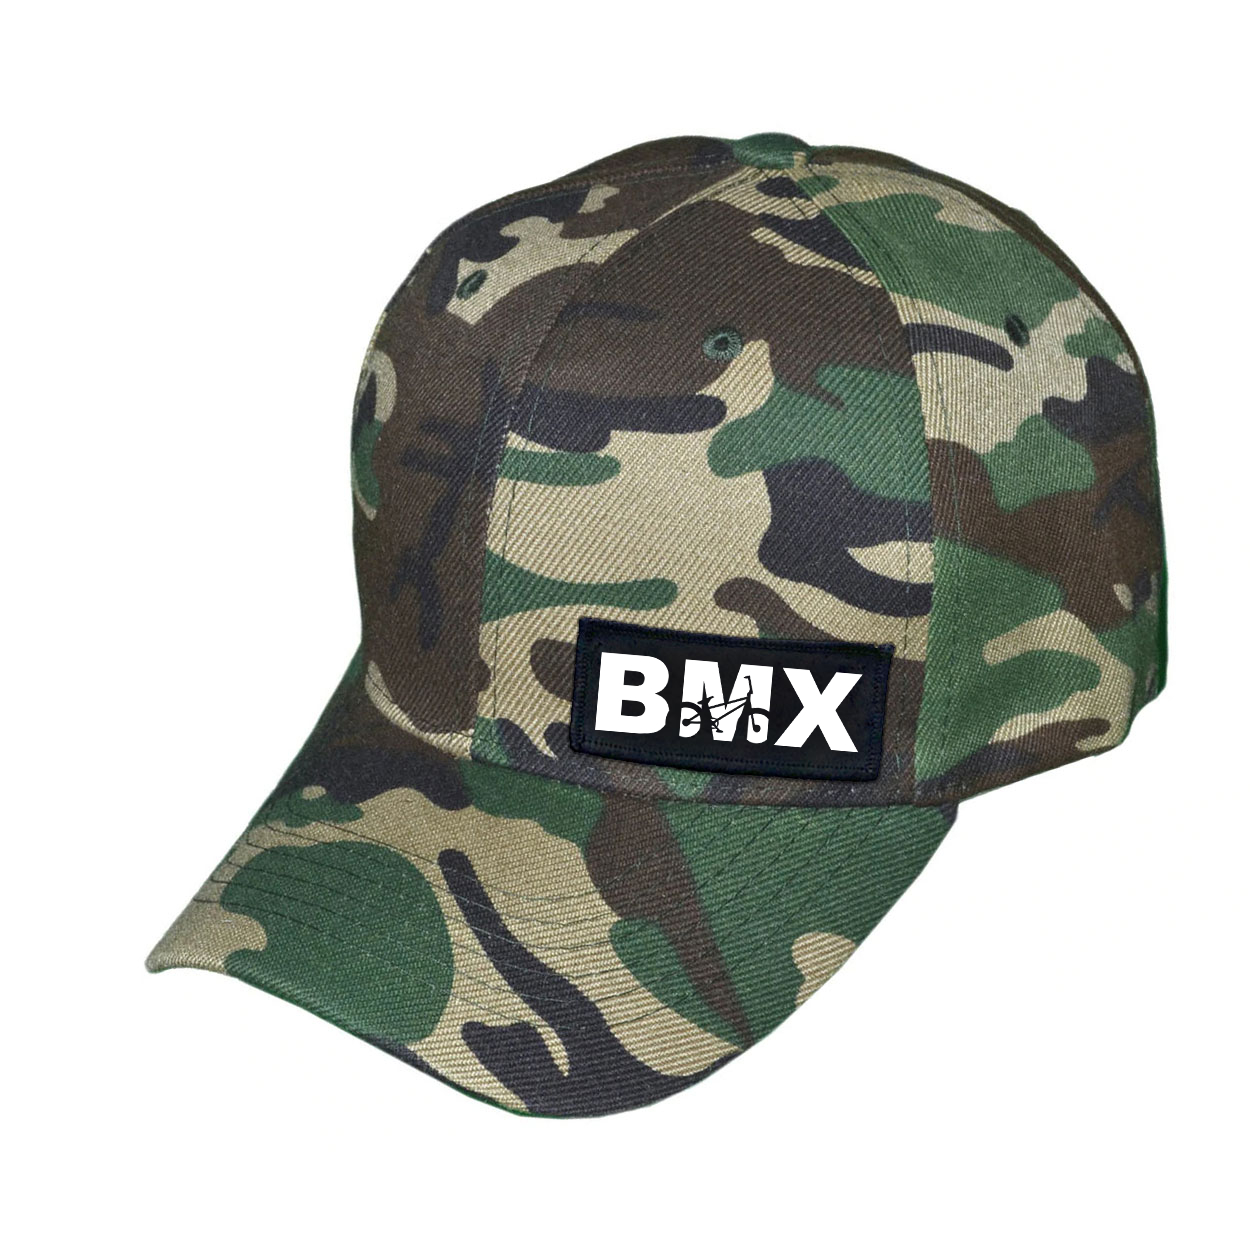 BMX Bike Logo Night Out Woven Patch Hat Camo (White Logo)